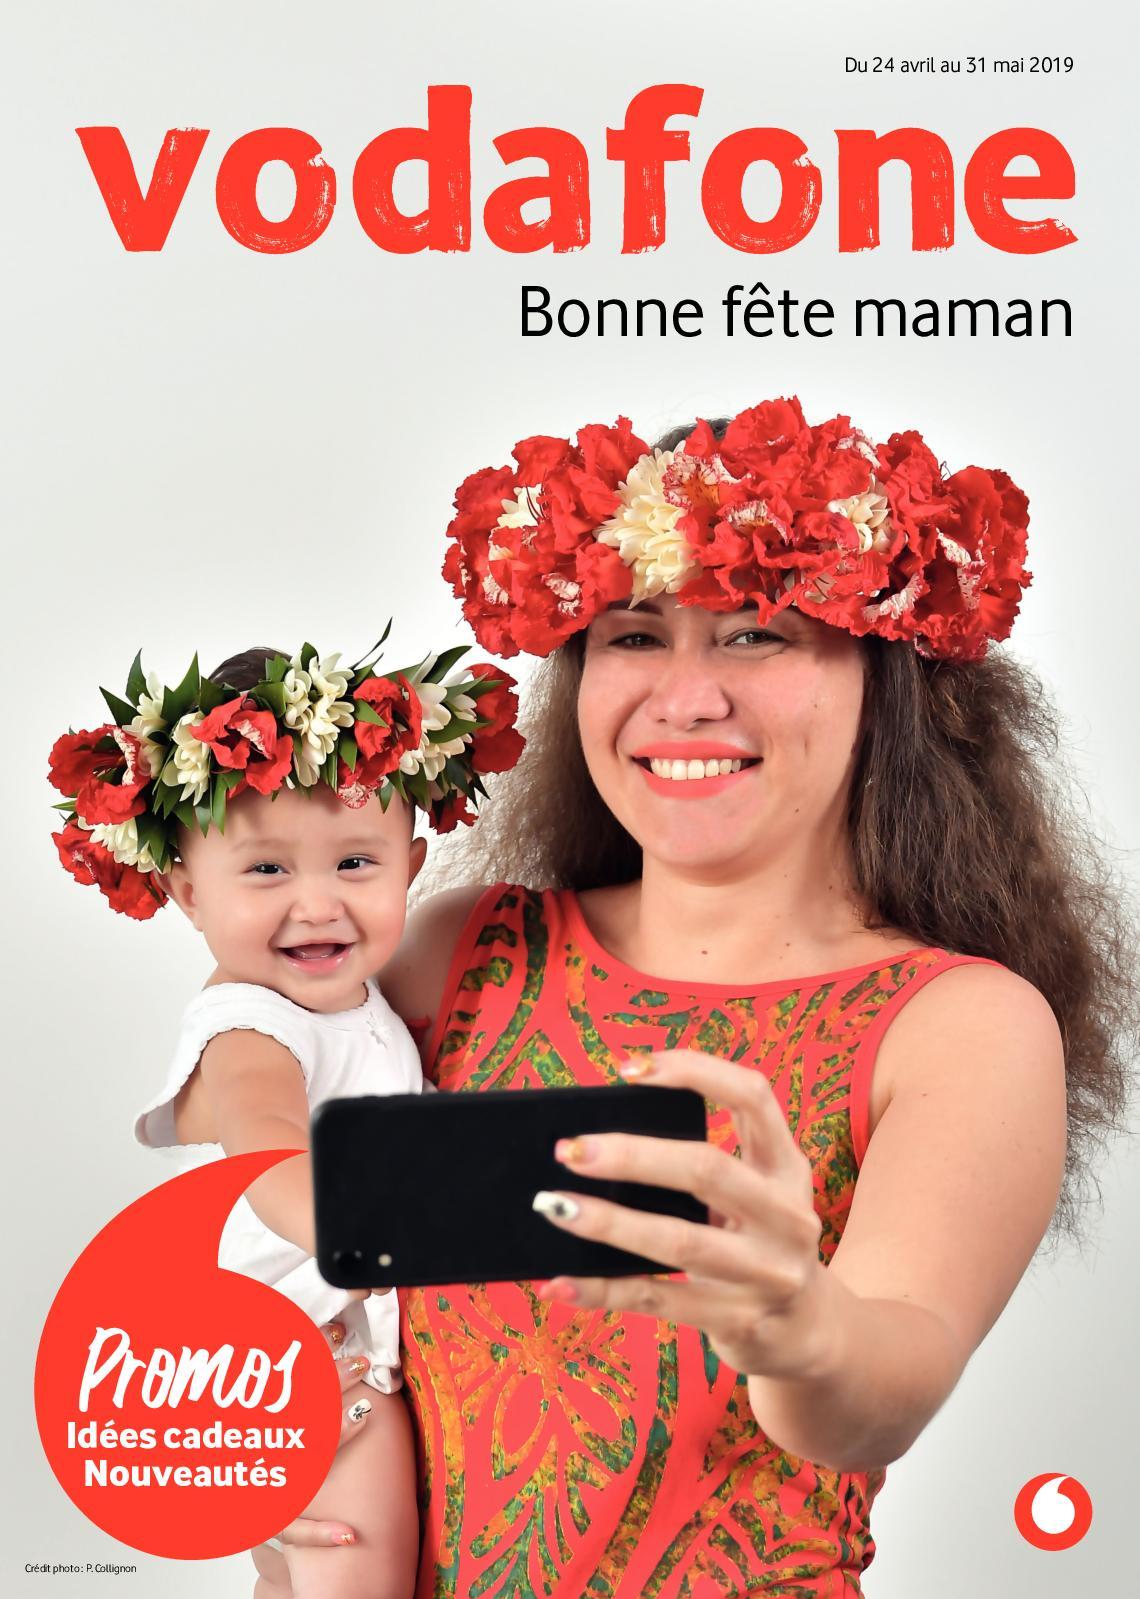 Catalogue Vodafone - Avril 2019